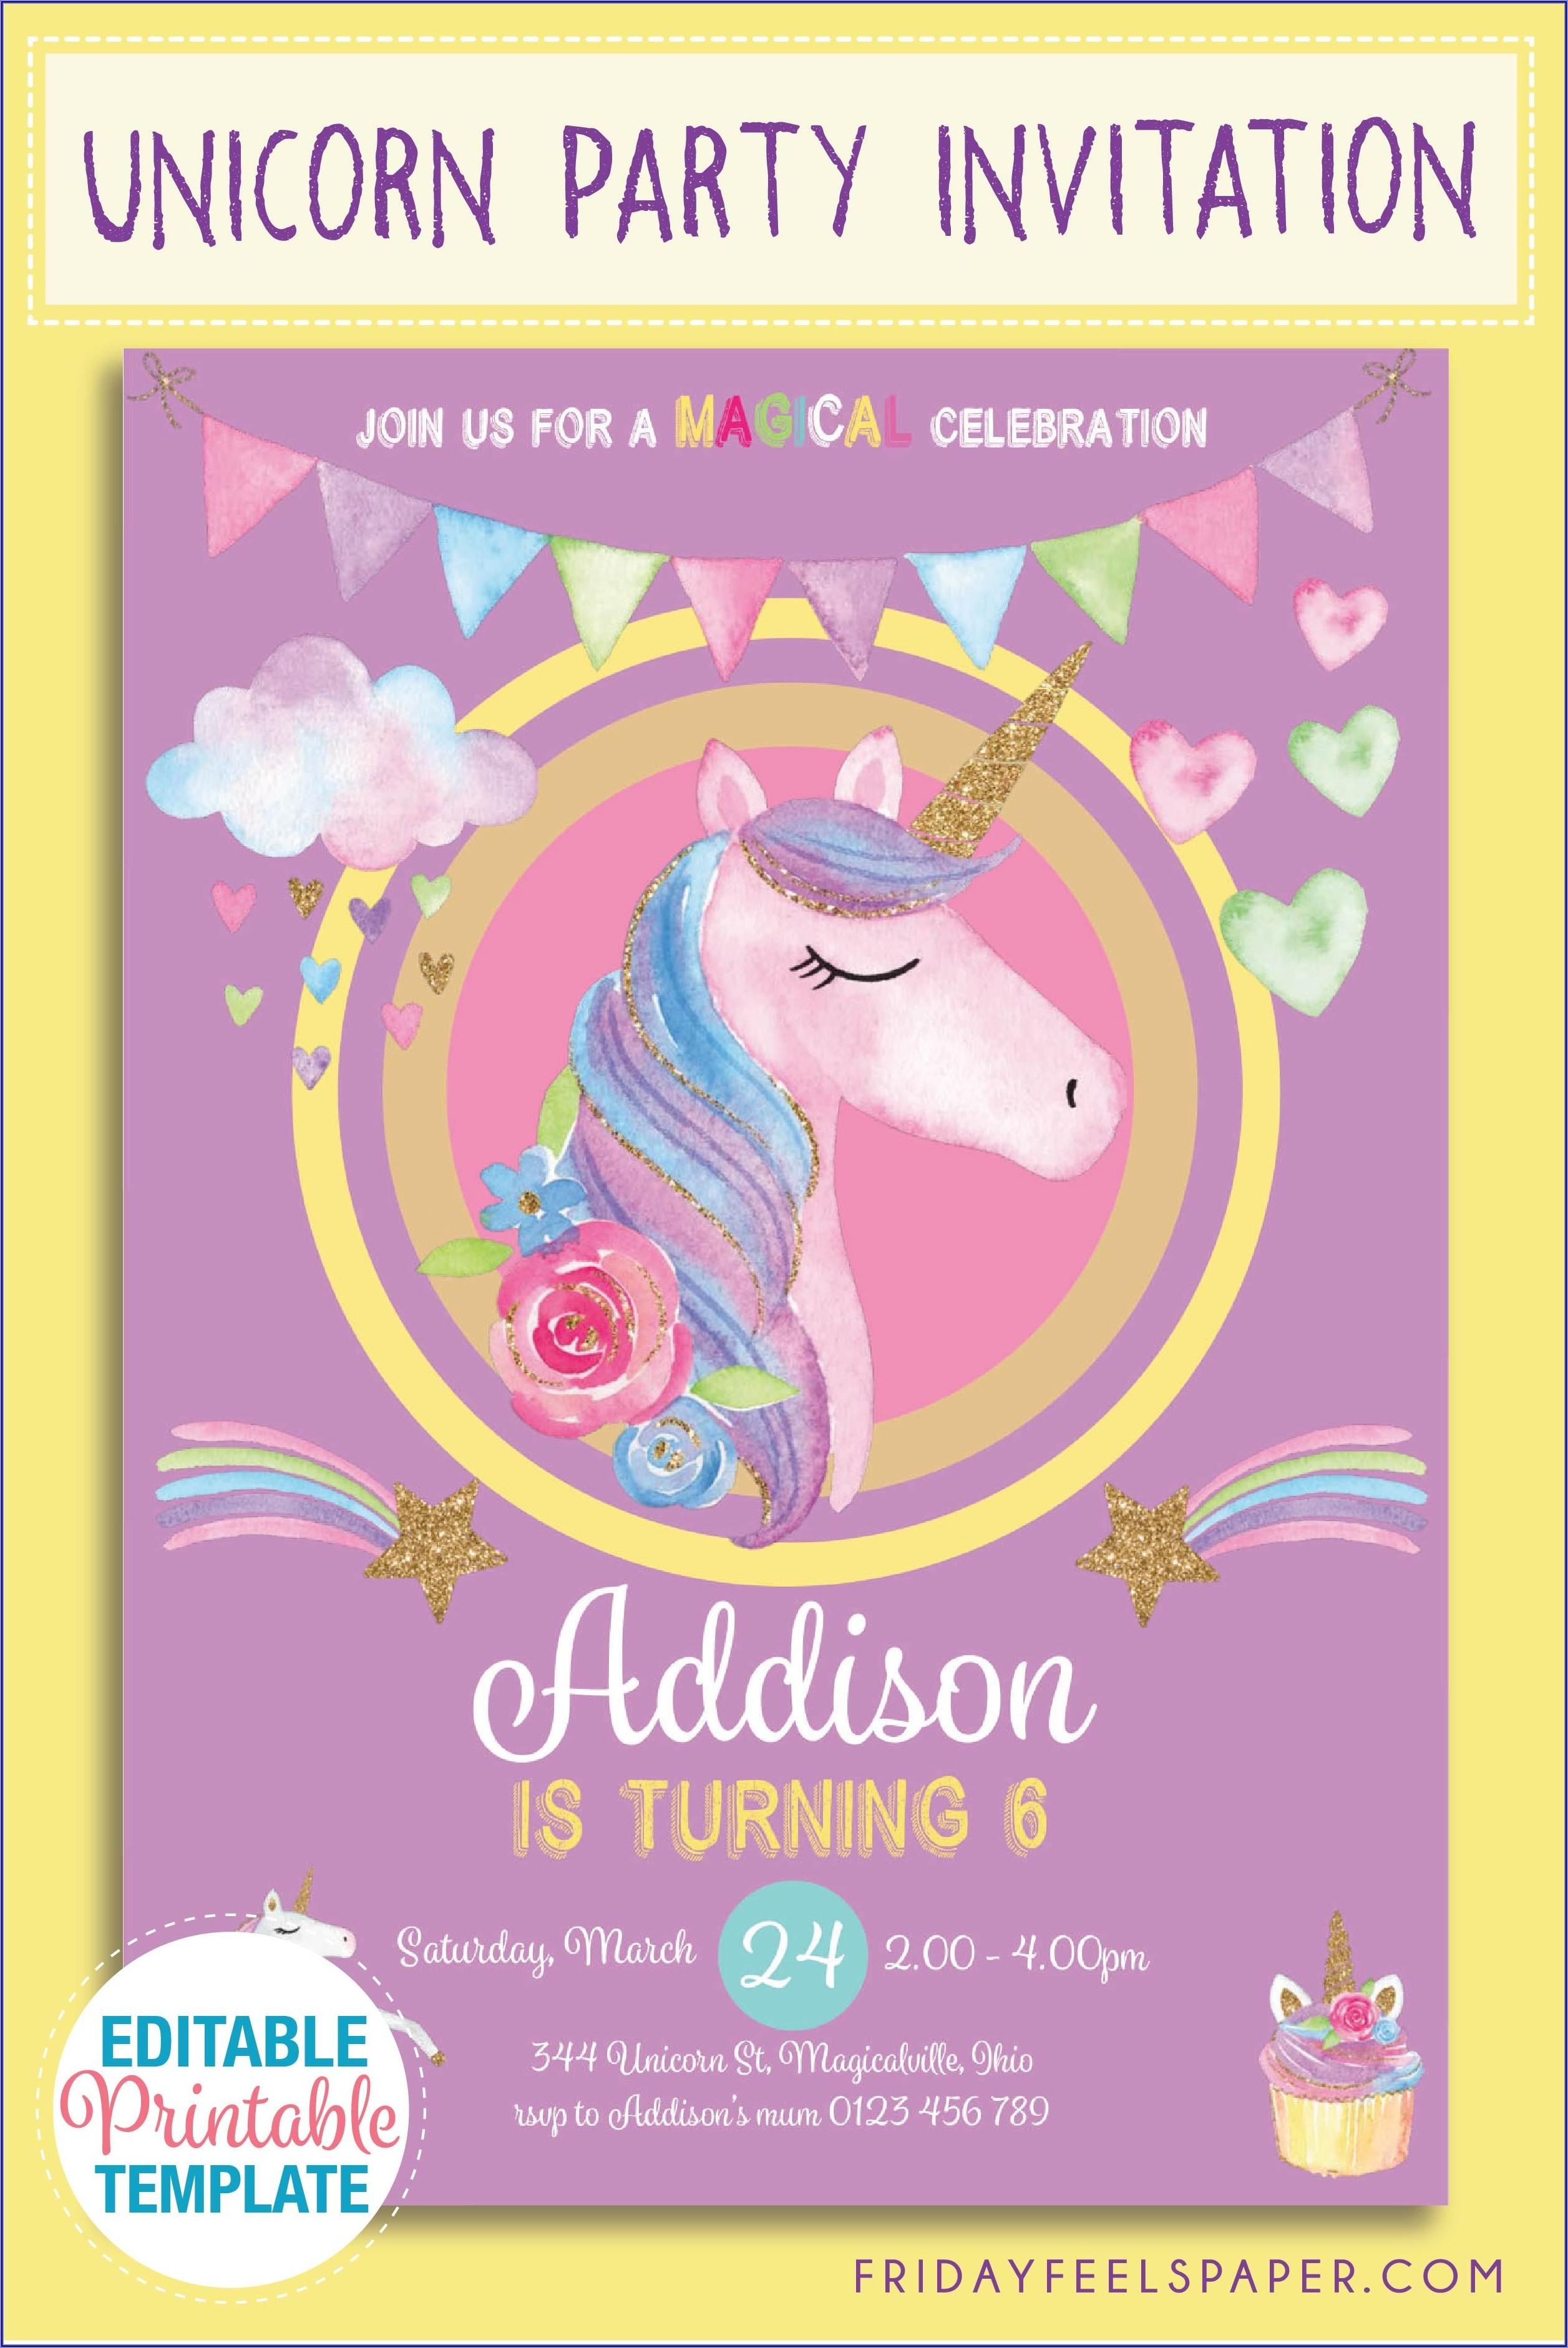 Free Editable Unicorn Party Invitations